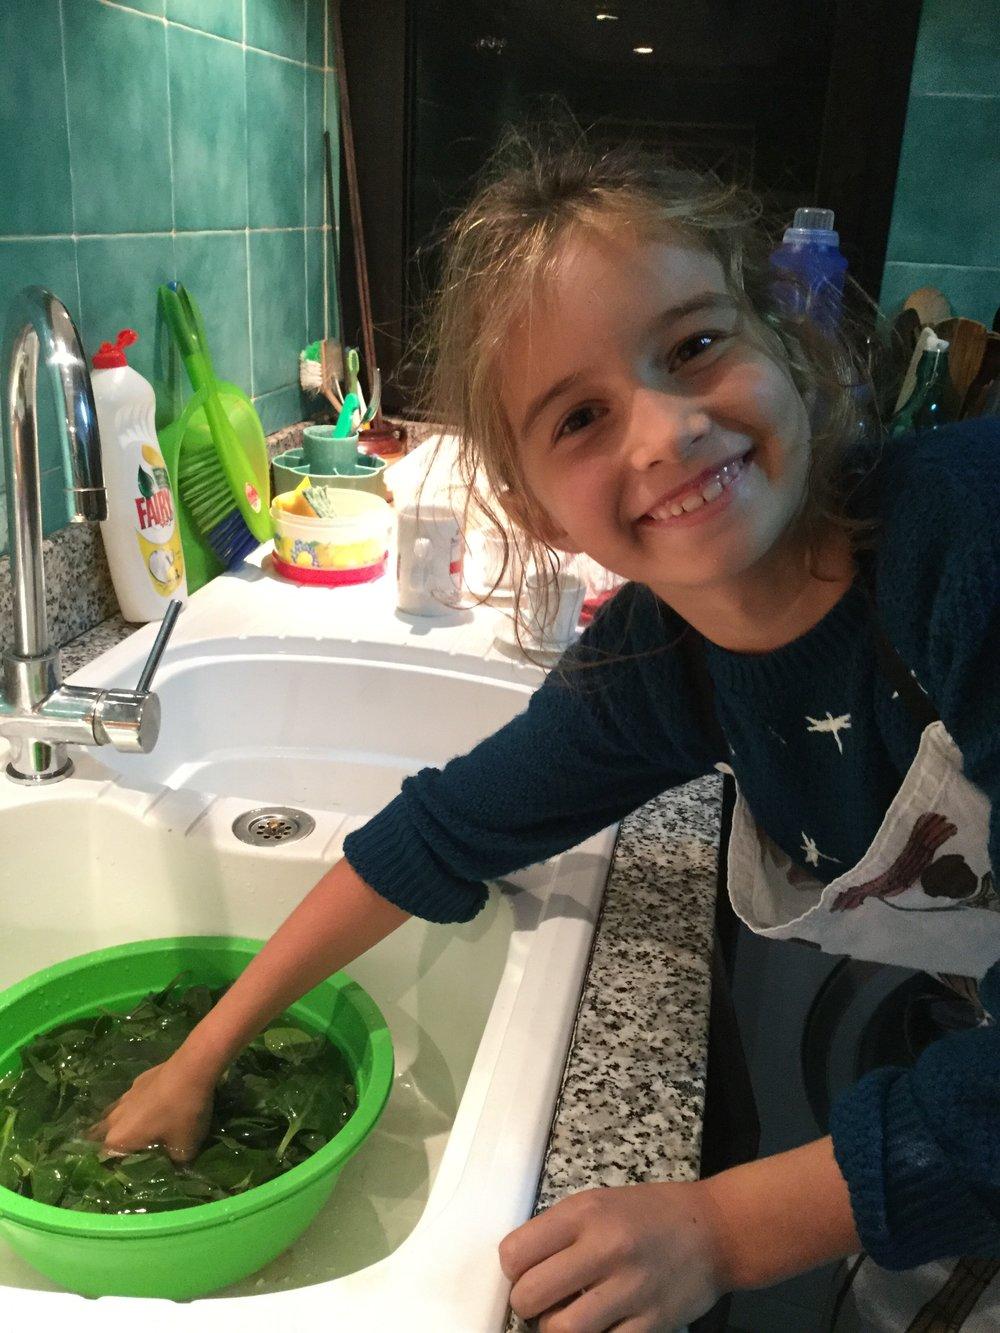 Lili washing spinach.